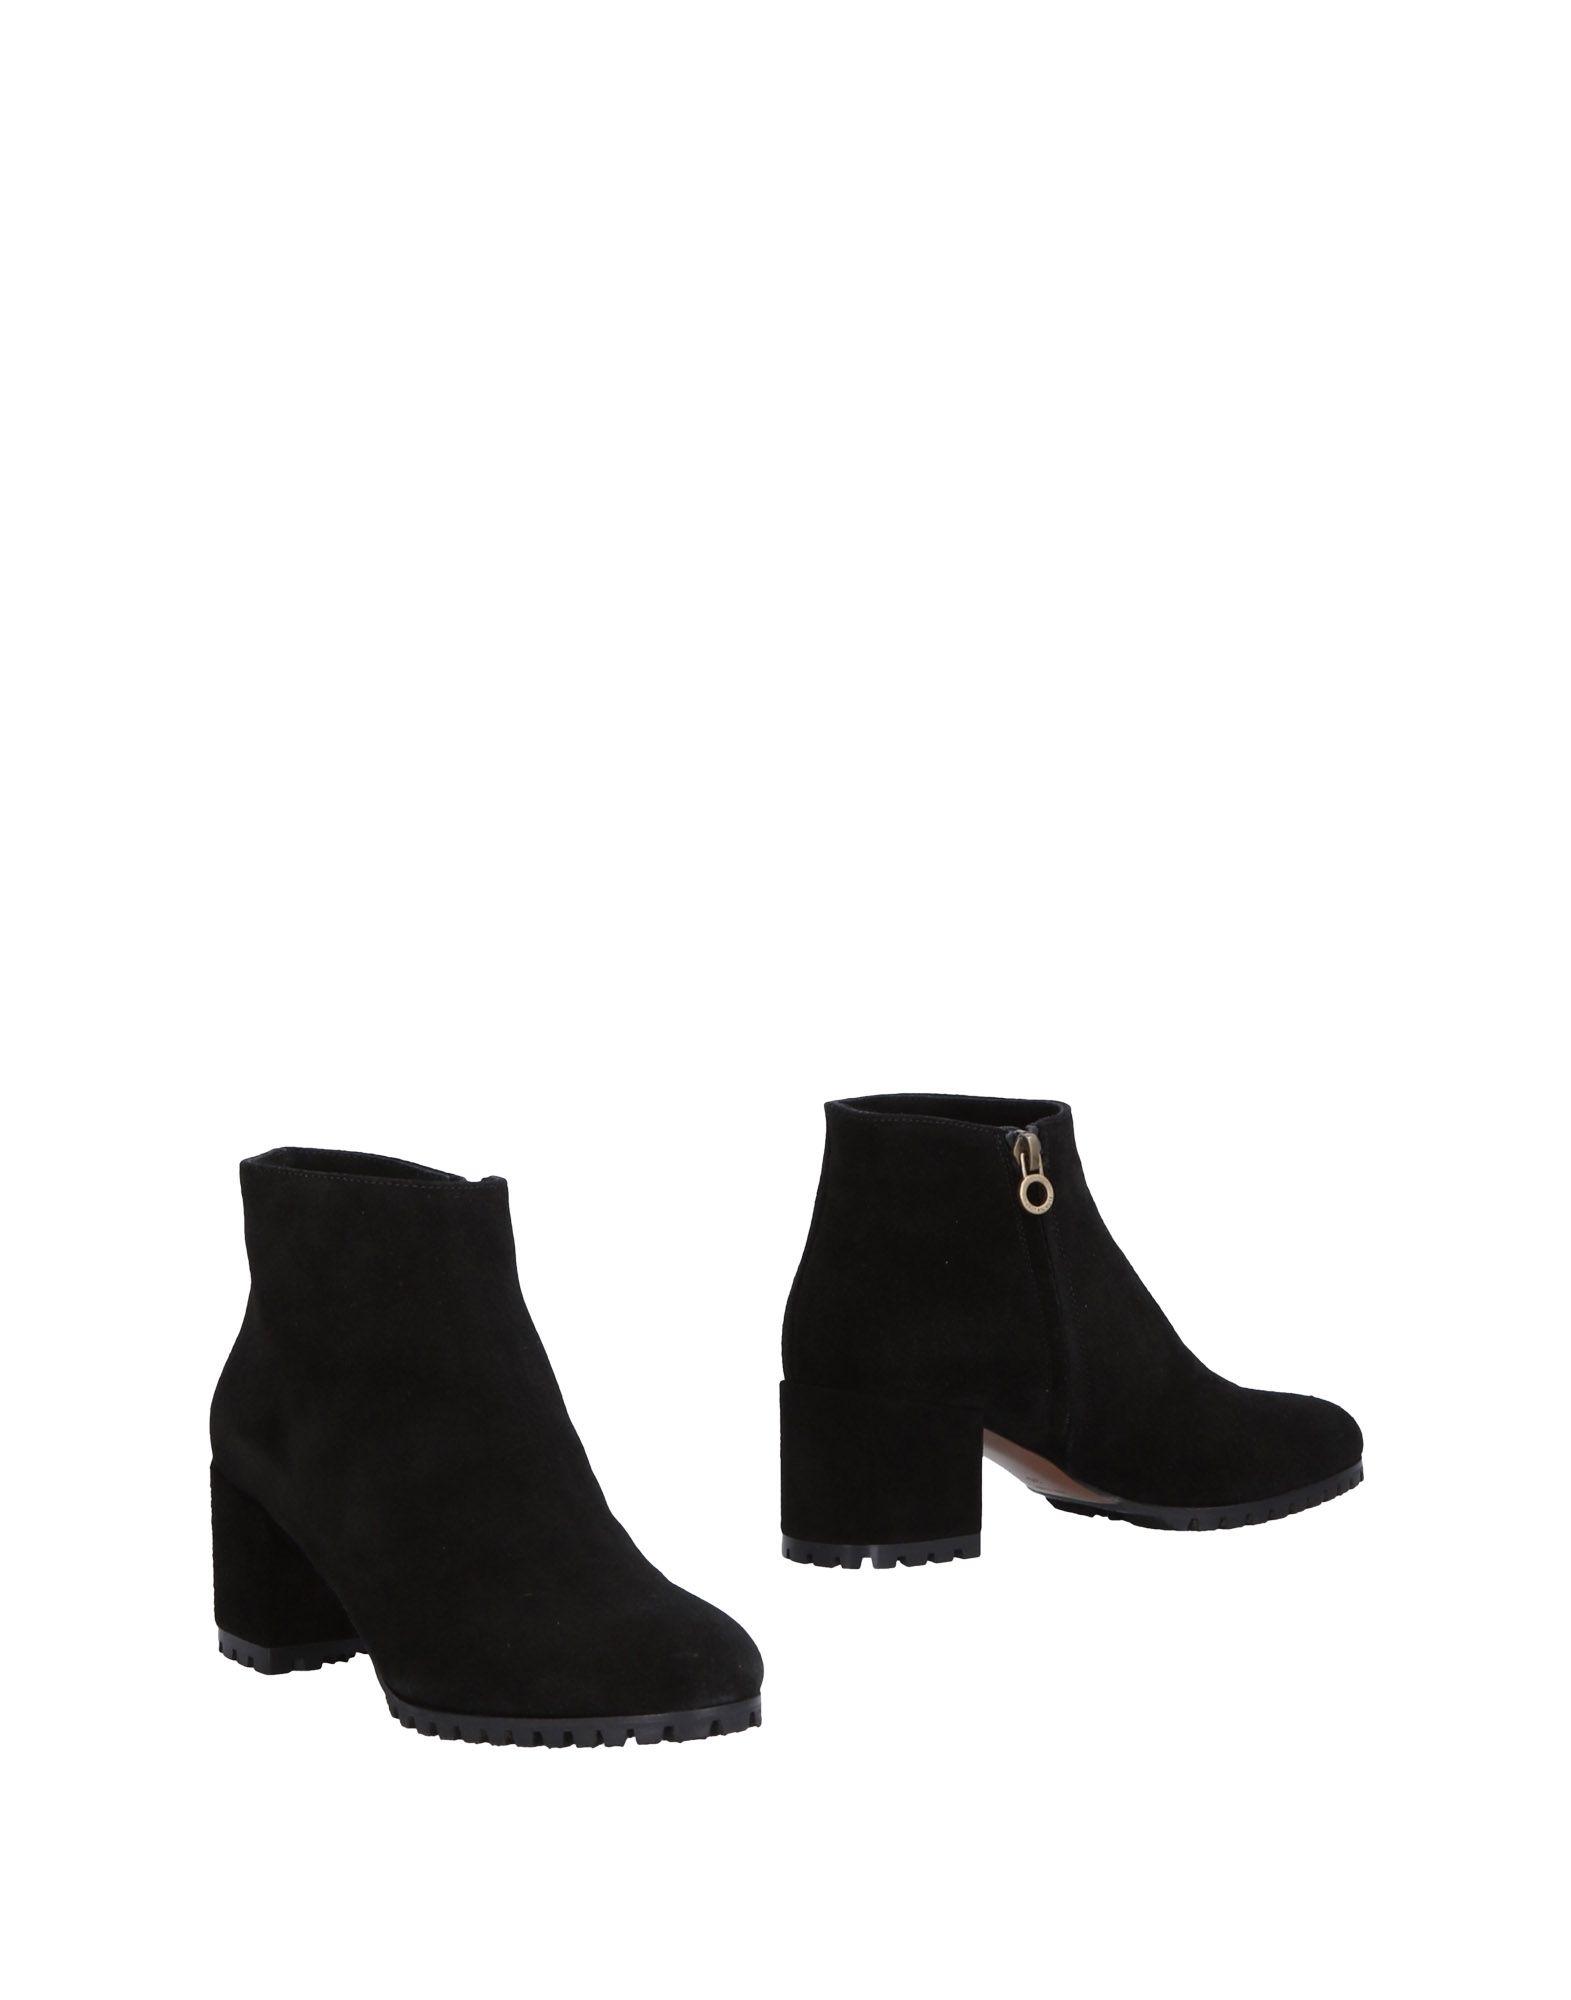 L' Autre Chose Stiefelette Damen  11460318KCGut aussehende strapazierfähige Schuhe